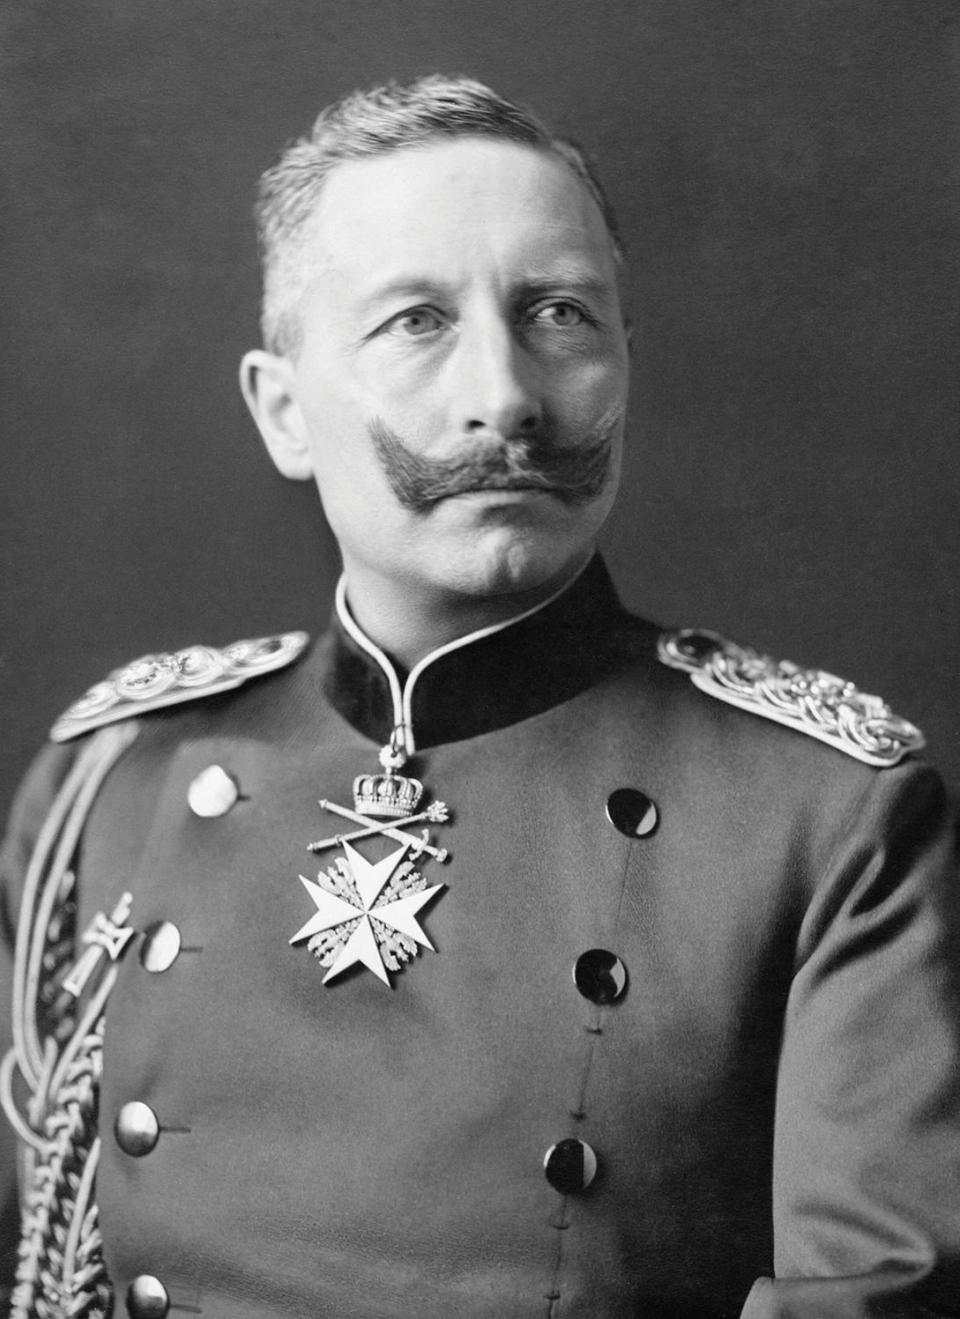 A 1902 portrait of Kaiser Wilhelm II of Germany